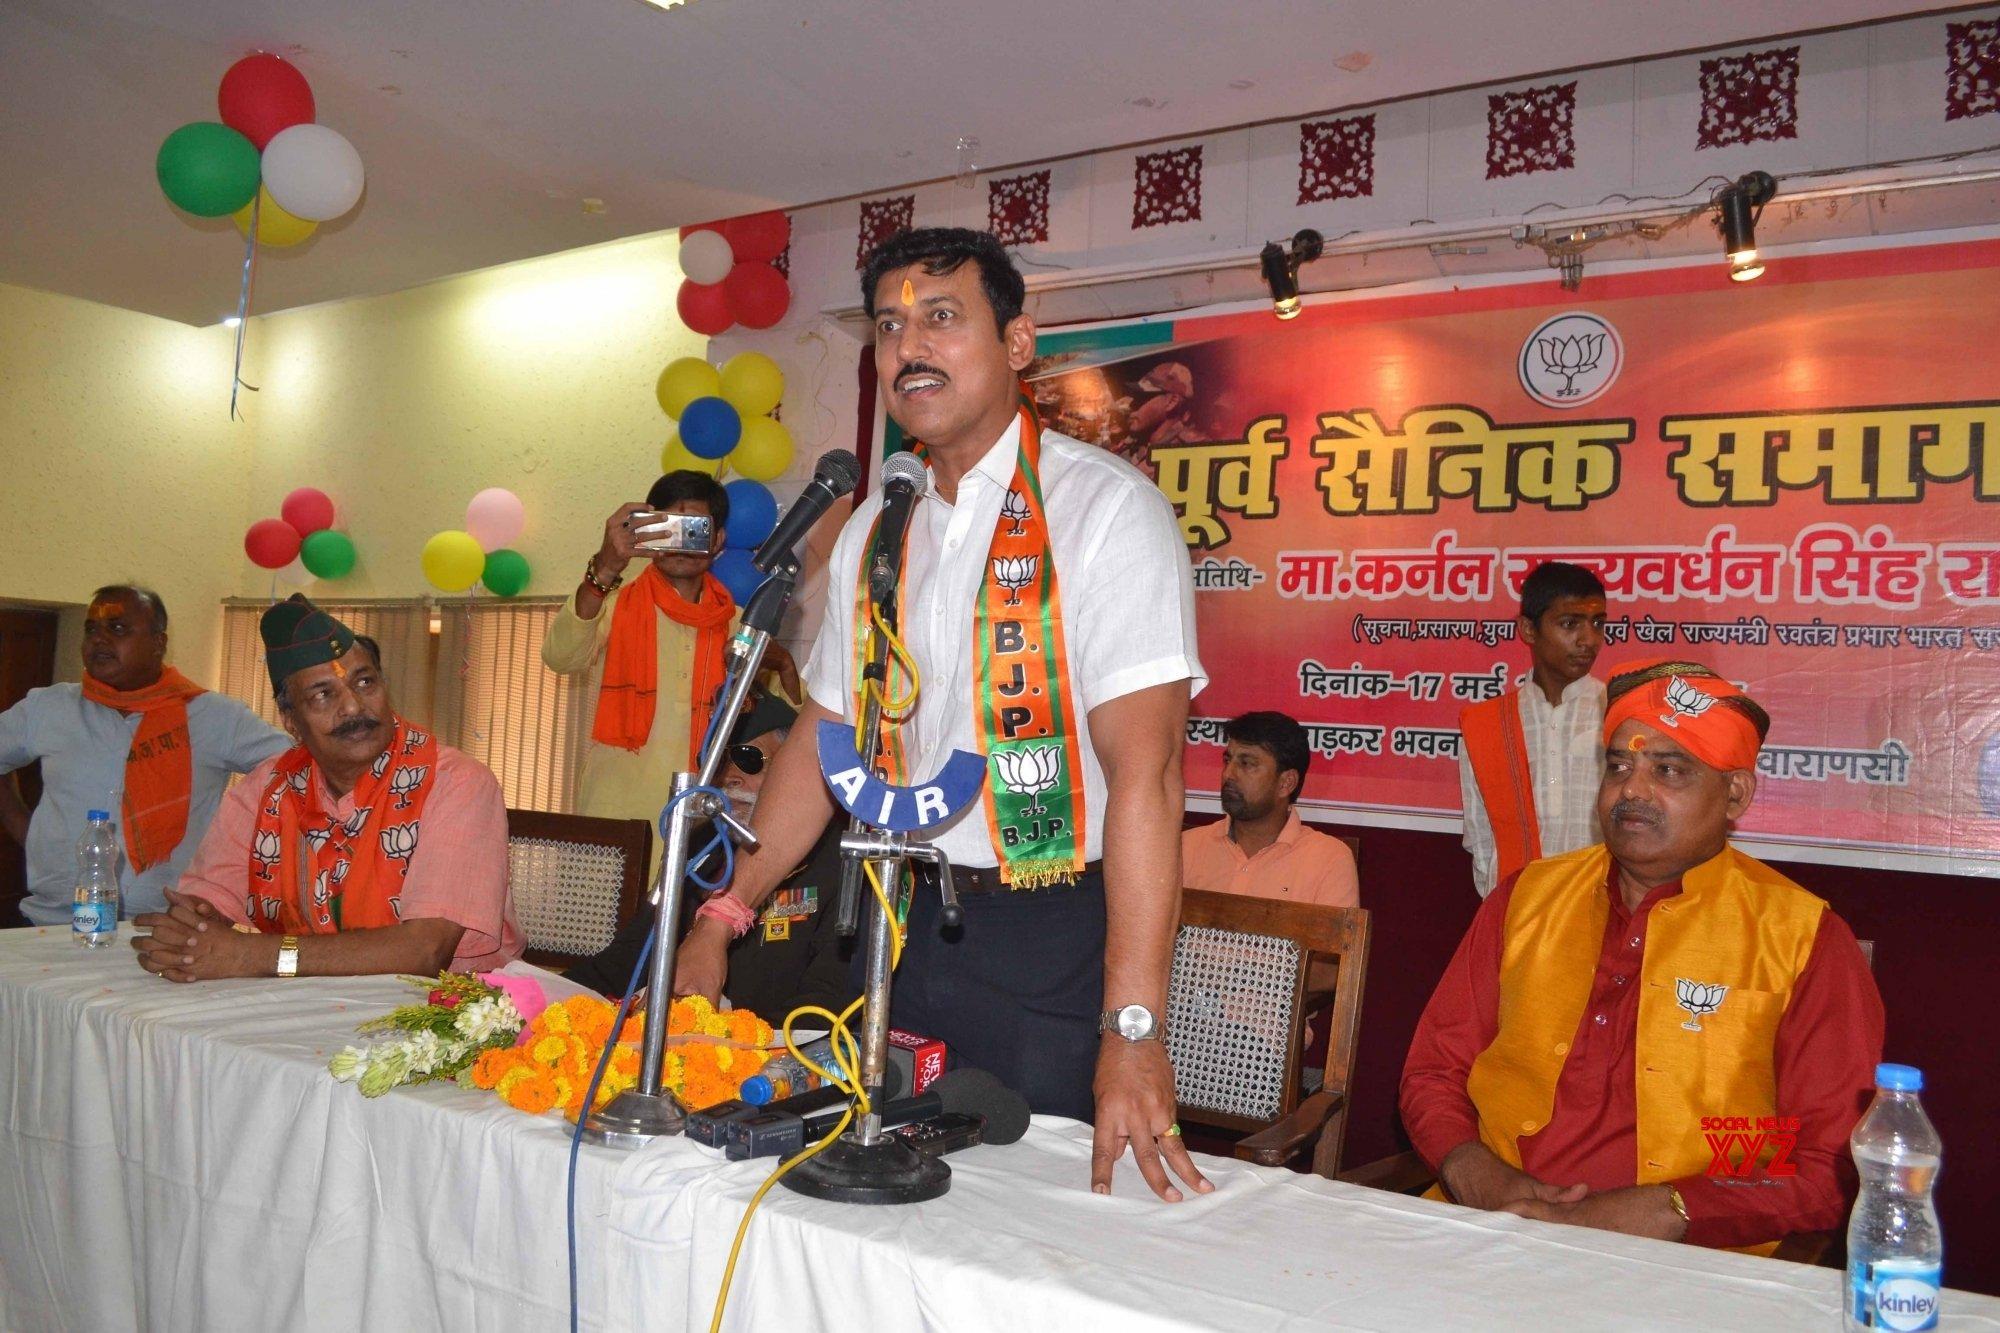 Varanasi: Rajyavardhan Singh Rathore at BJP programme #Gallery